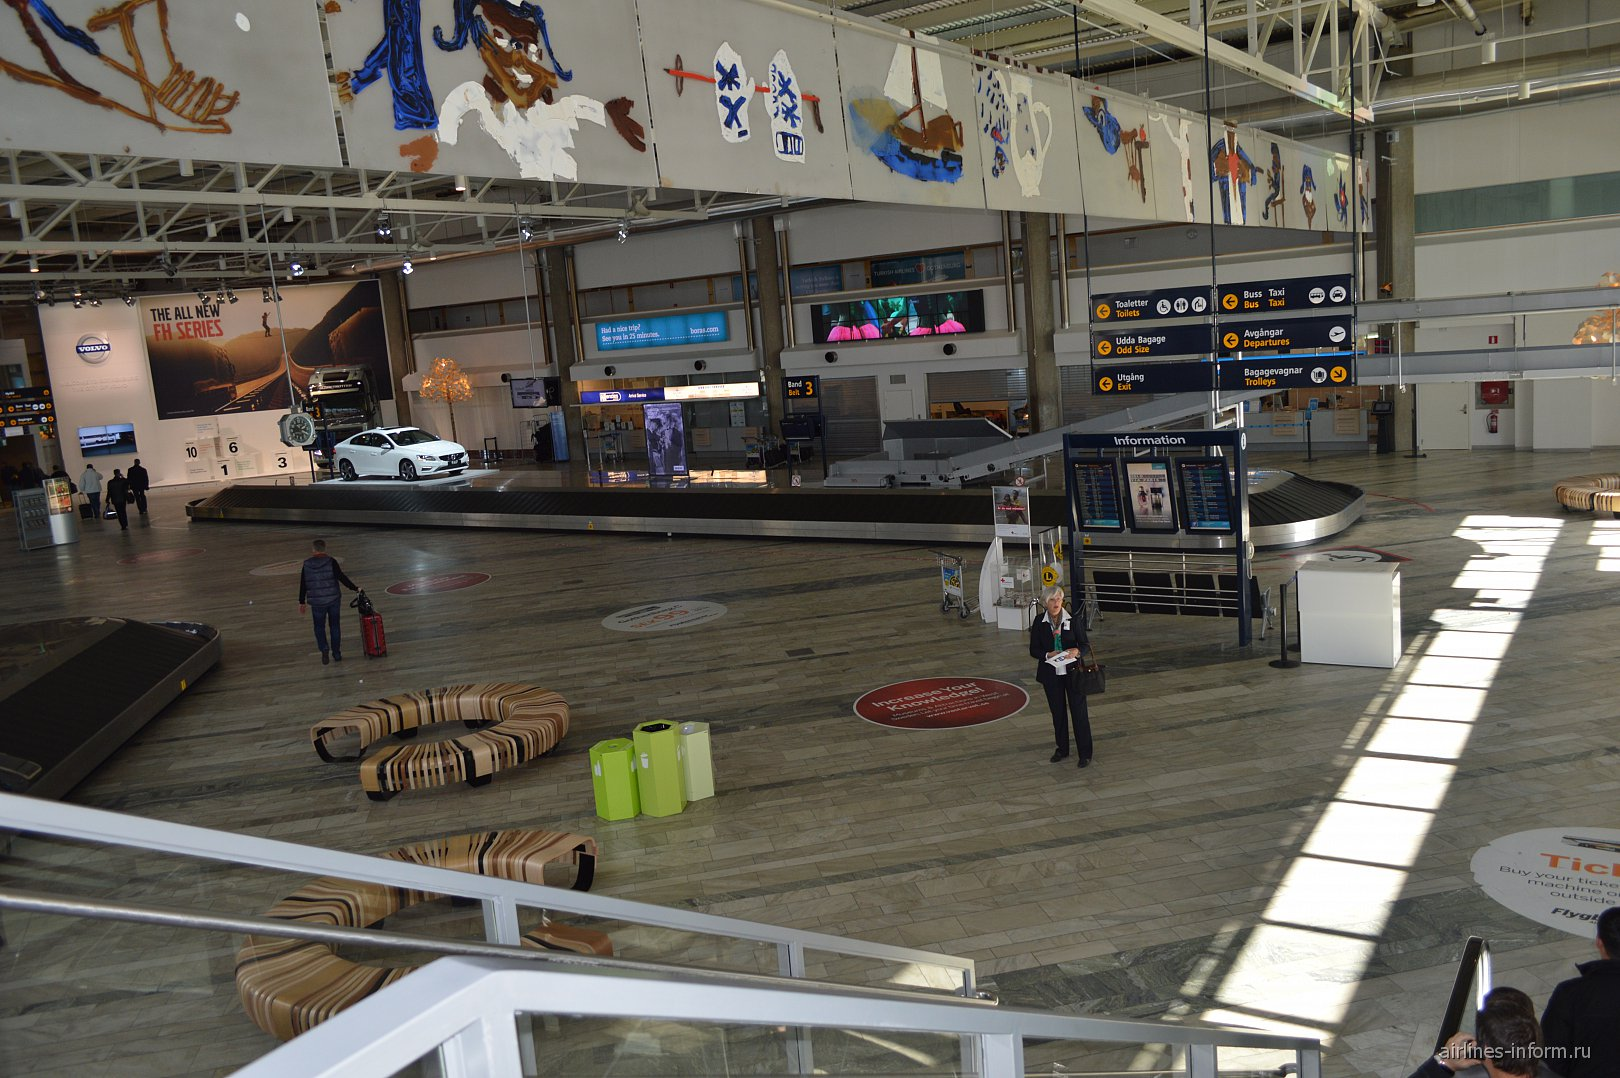 Зал выдачи багажа в аэропорту Гётеборг Ландветтер